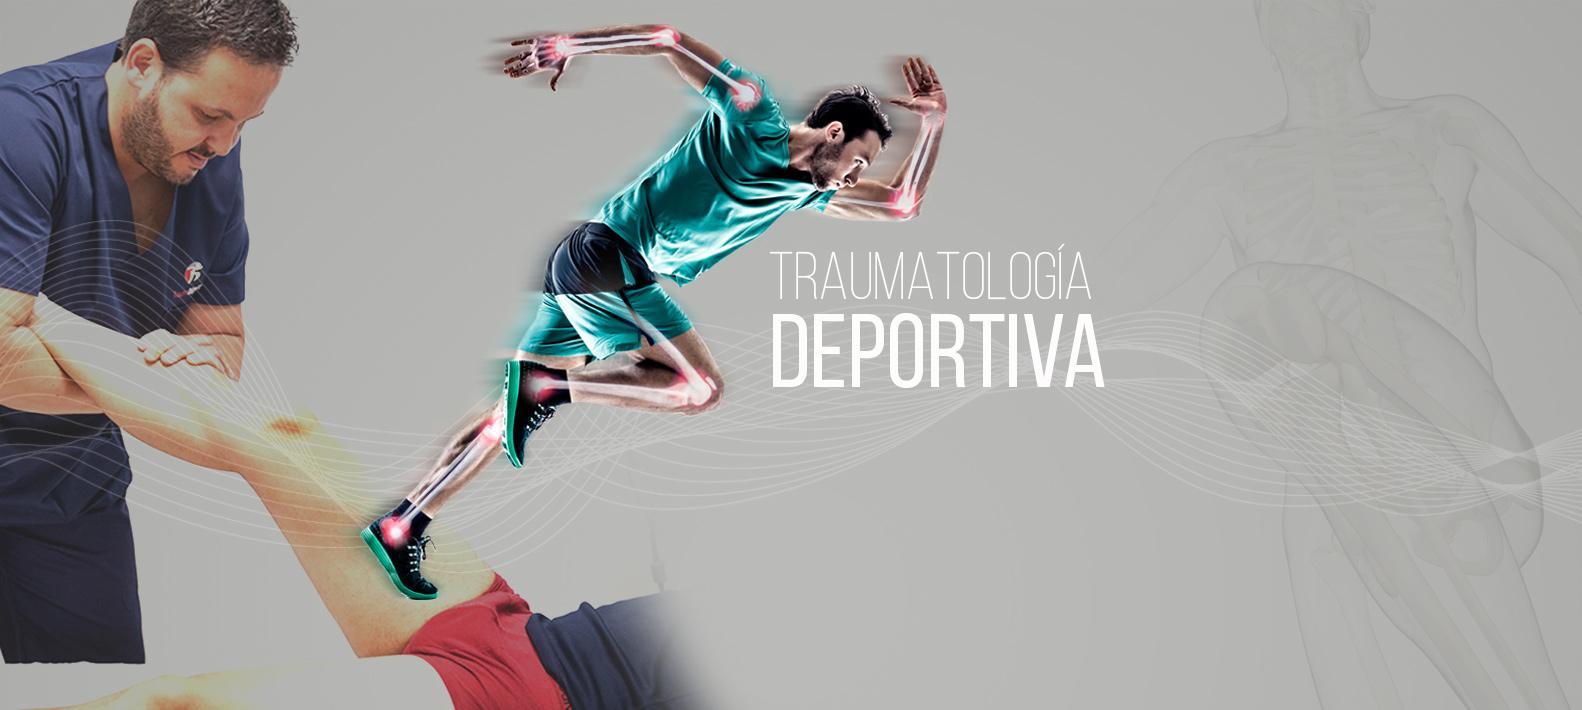 Traumatología Deportiva